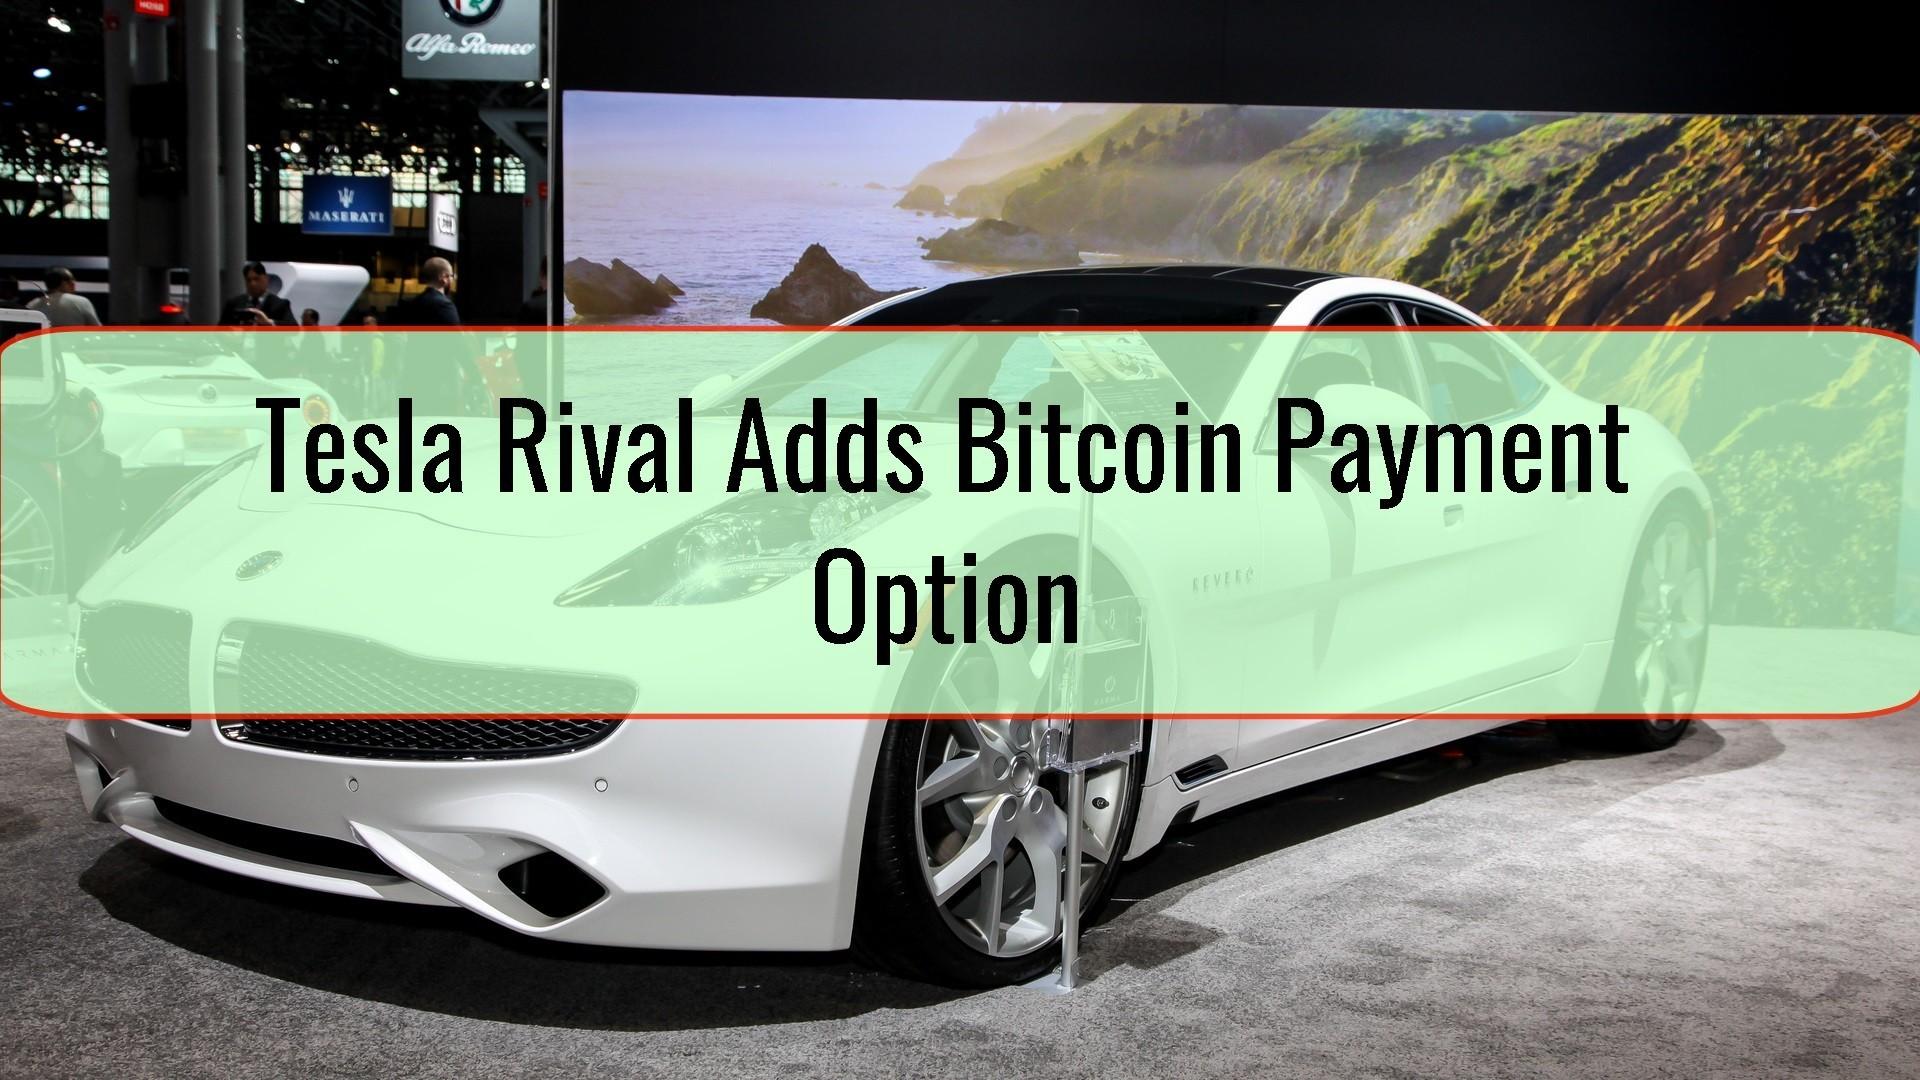 Tesla Rival Adds Bitcoin Payment Option